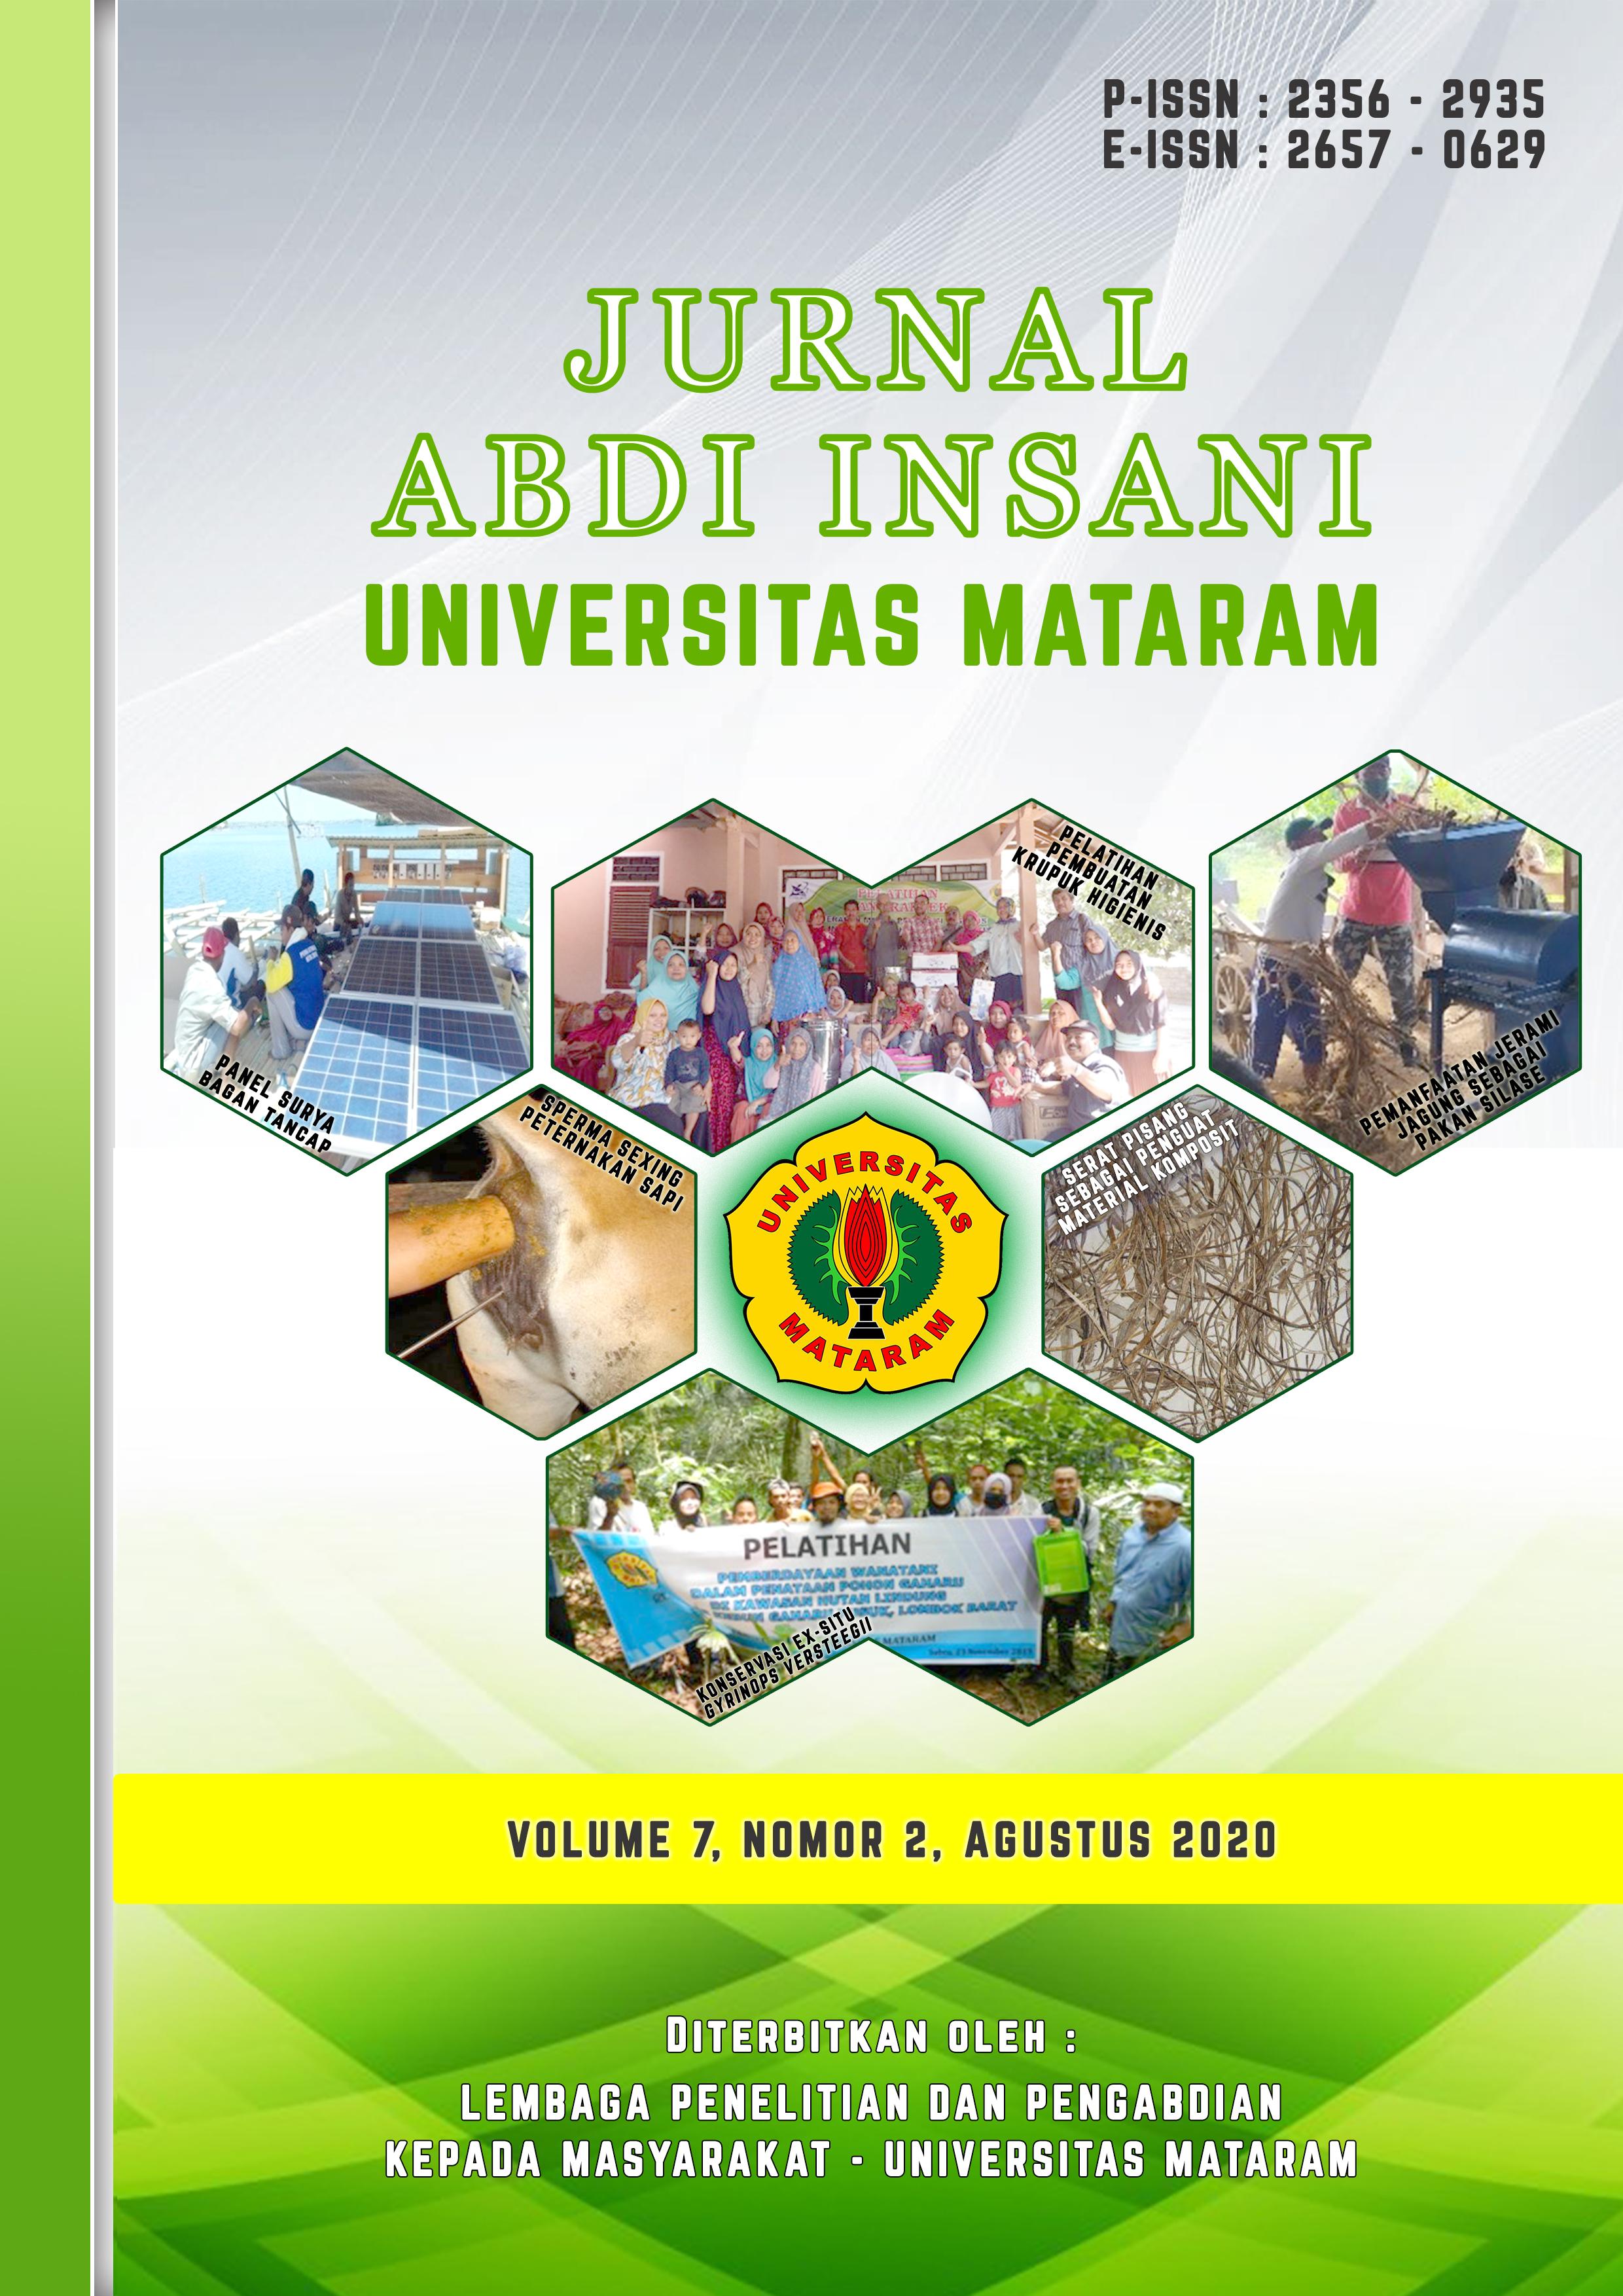 Jurnal Abdi Insani Universitas Mataram